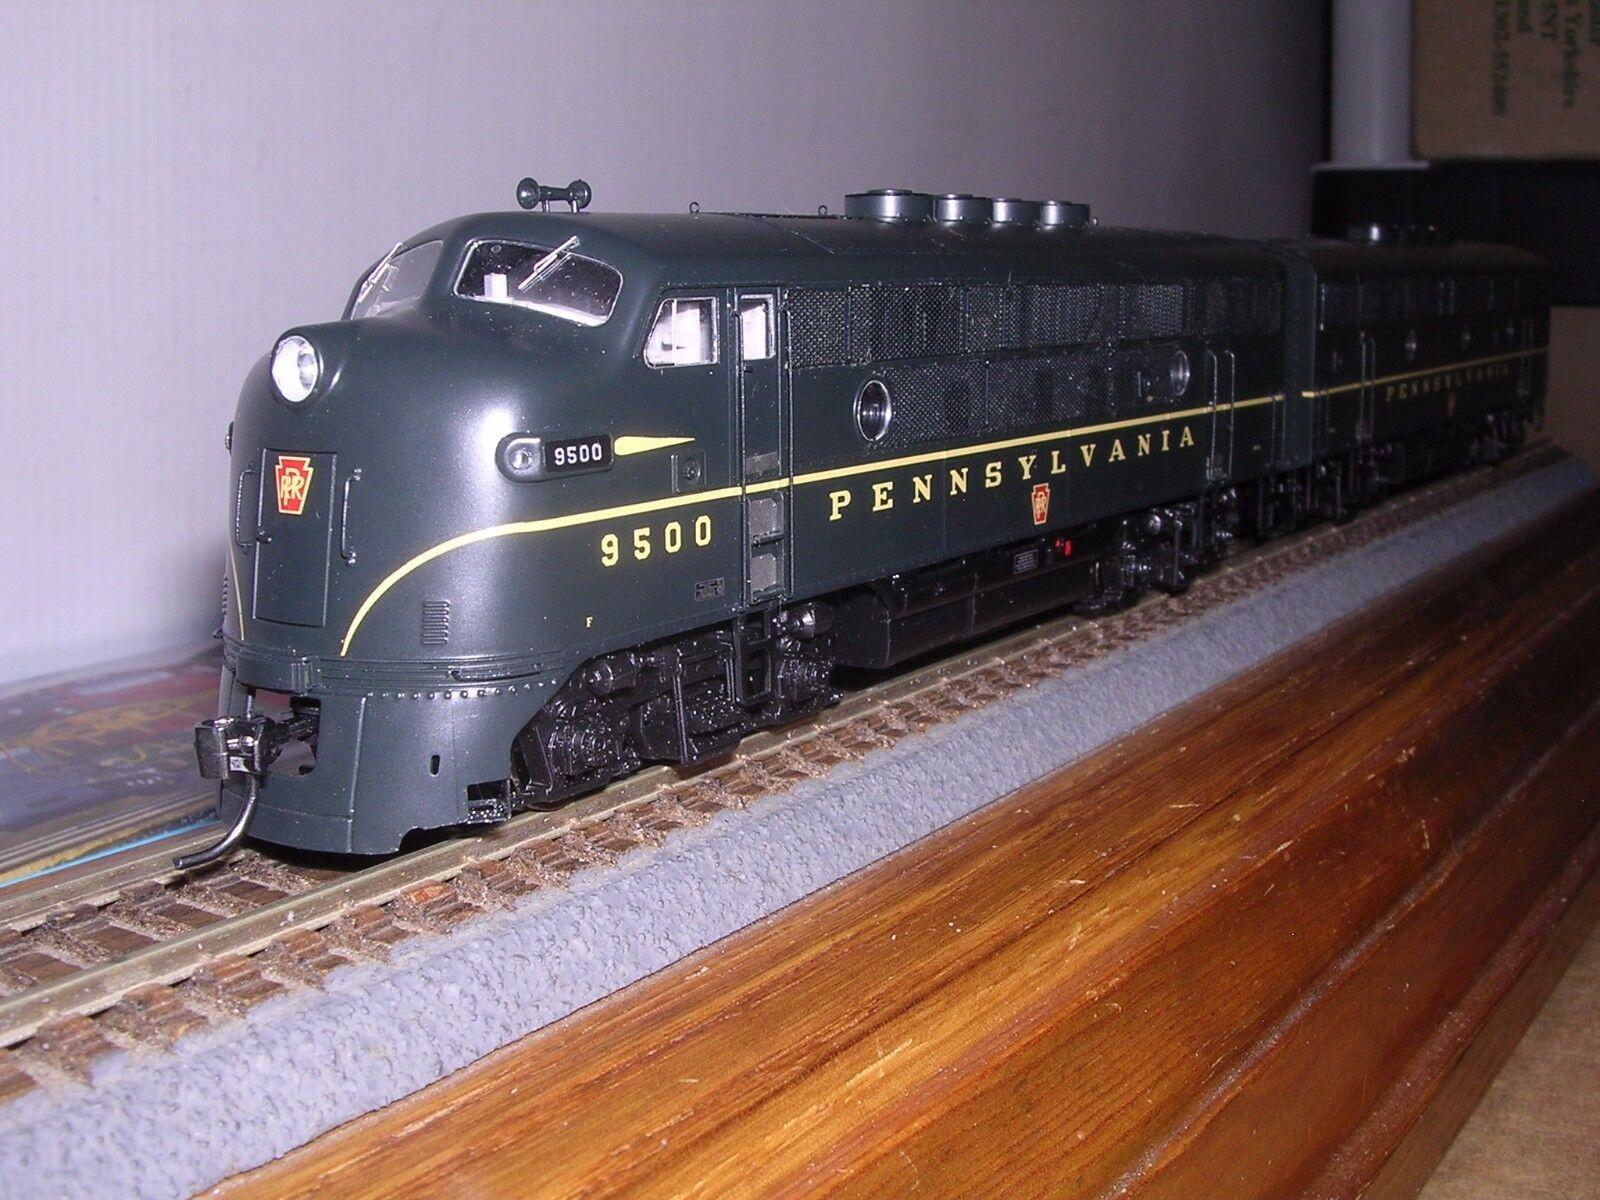 AthGenesis G2523A&B P.R.R. EMD F-3A&B locomotoras diesel 9500 con DCC y Sonido H.O.187